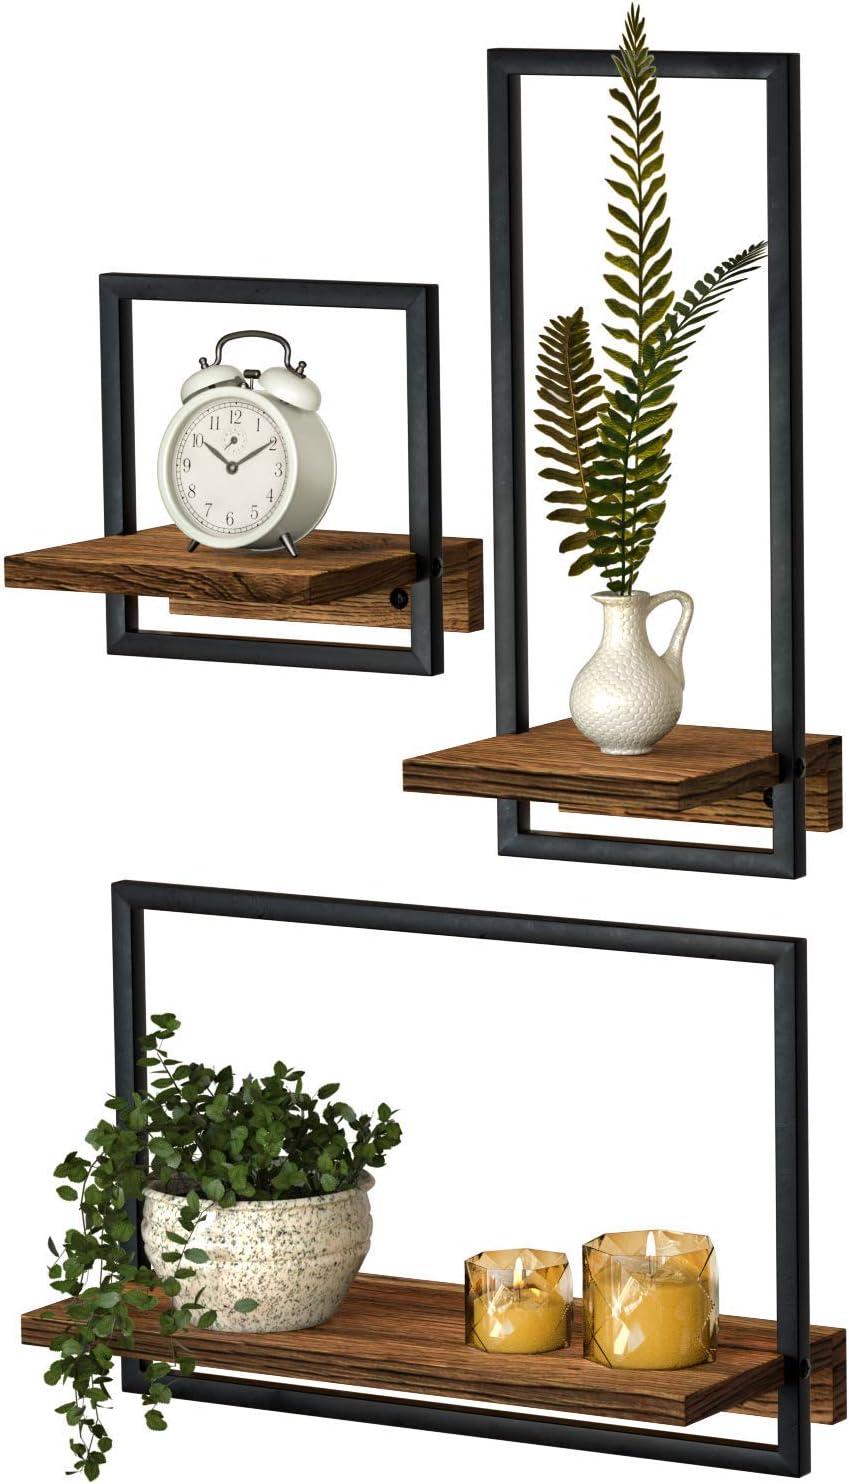 DELFOY Metal Frame Rustic Wooden Floating Hanging Shelves, Home Decor Wall Mounted Display Organizing Shelf for Living Room, Bedroom, Office Bathroom. Set of 3